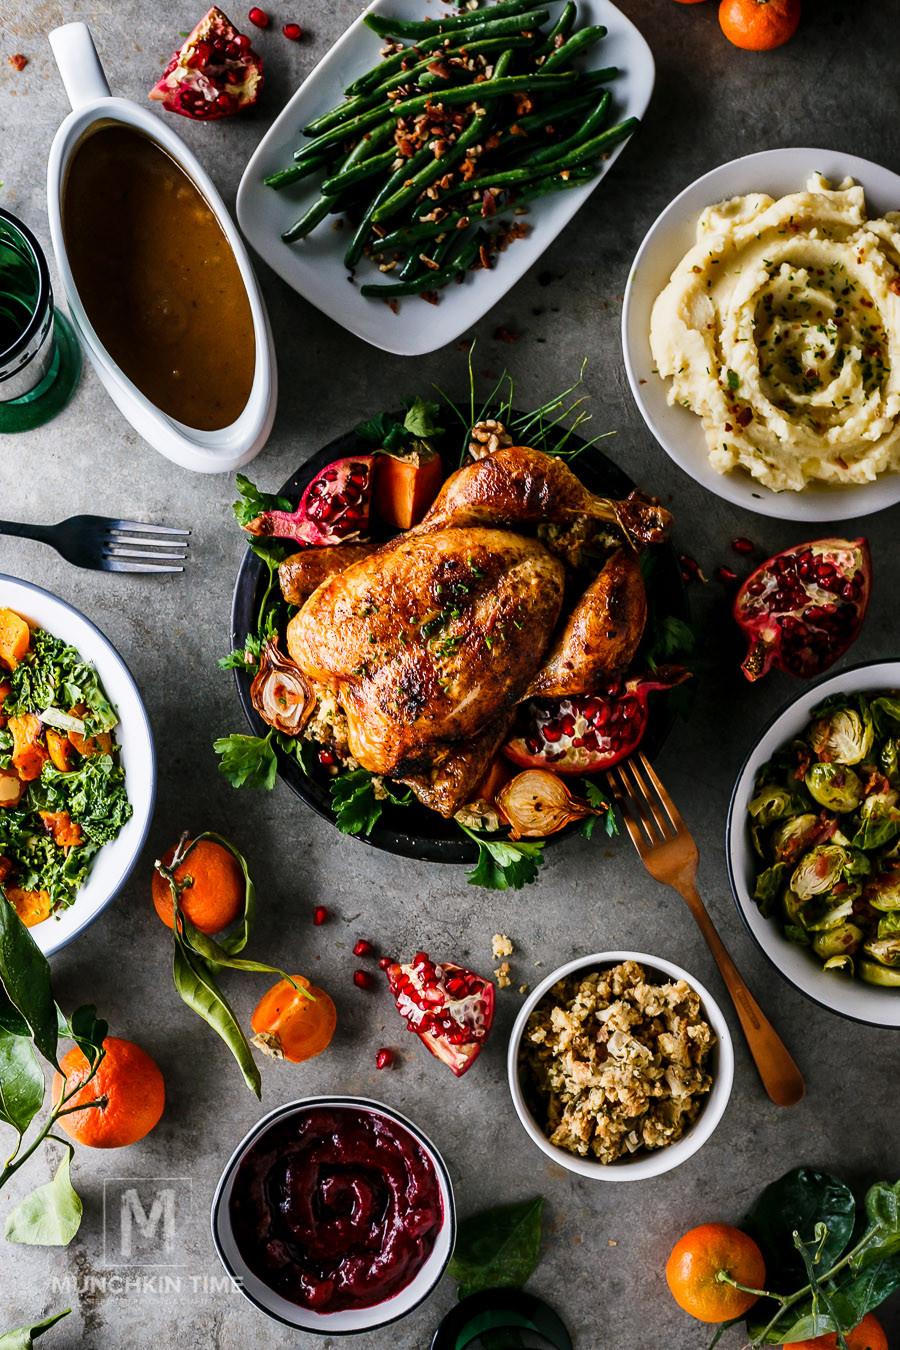 Craig'S Thanksgiving Dinner In A Can  7 Thanksgiving Dinner Ideas 2017 Munchkin Time